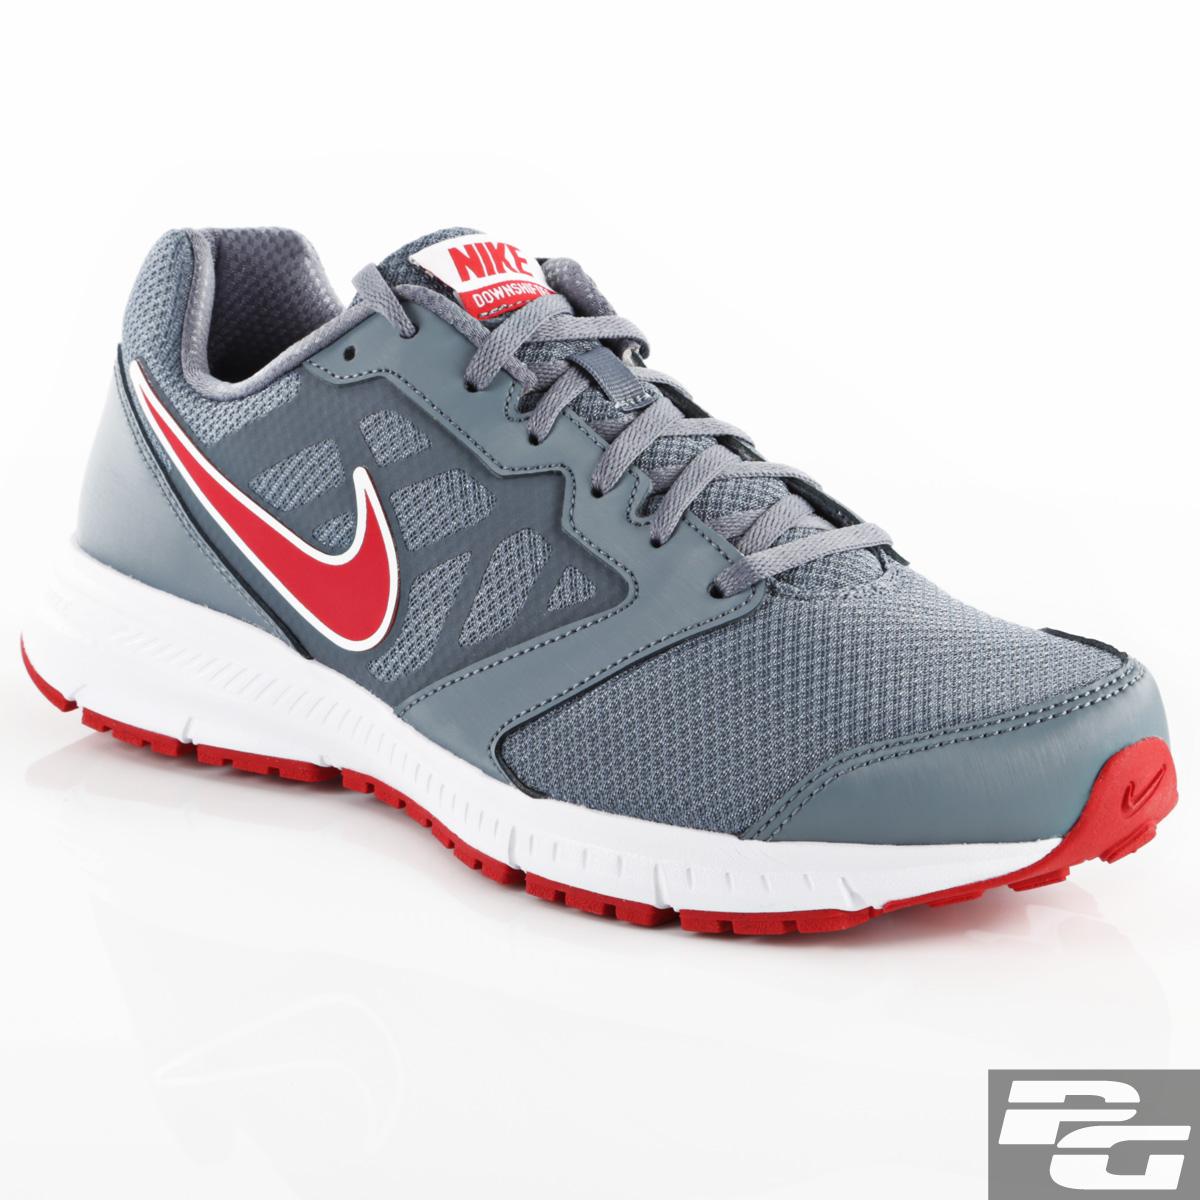 Nike Downshifter 6 MSL Schuhe Damen Herren Sportschuh Jogging